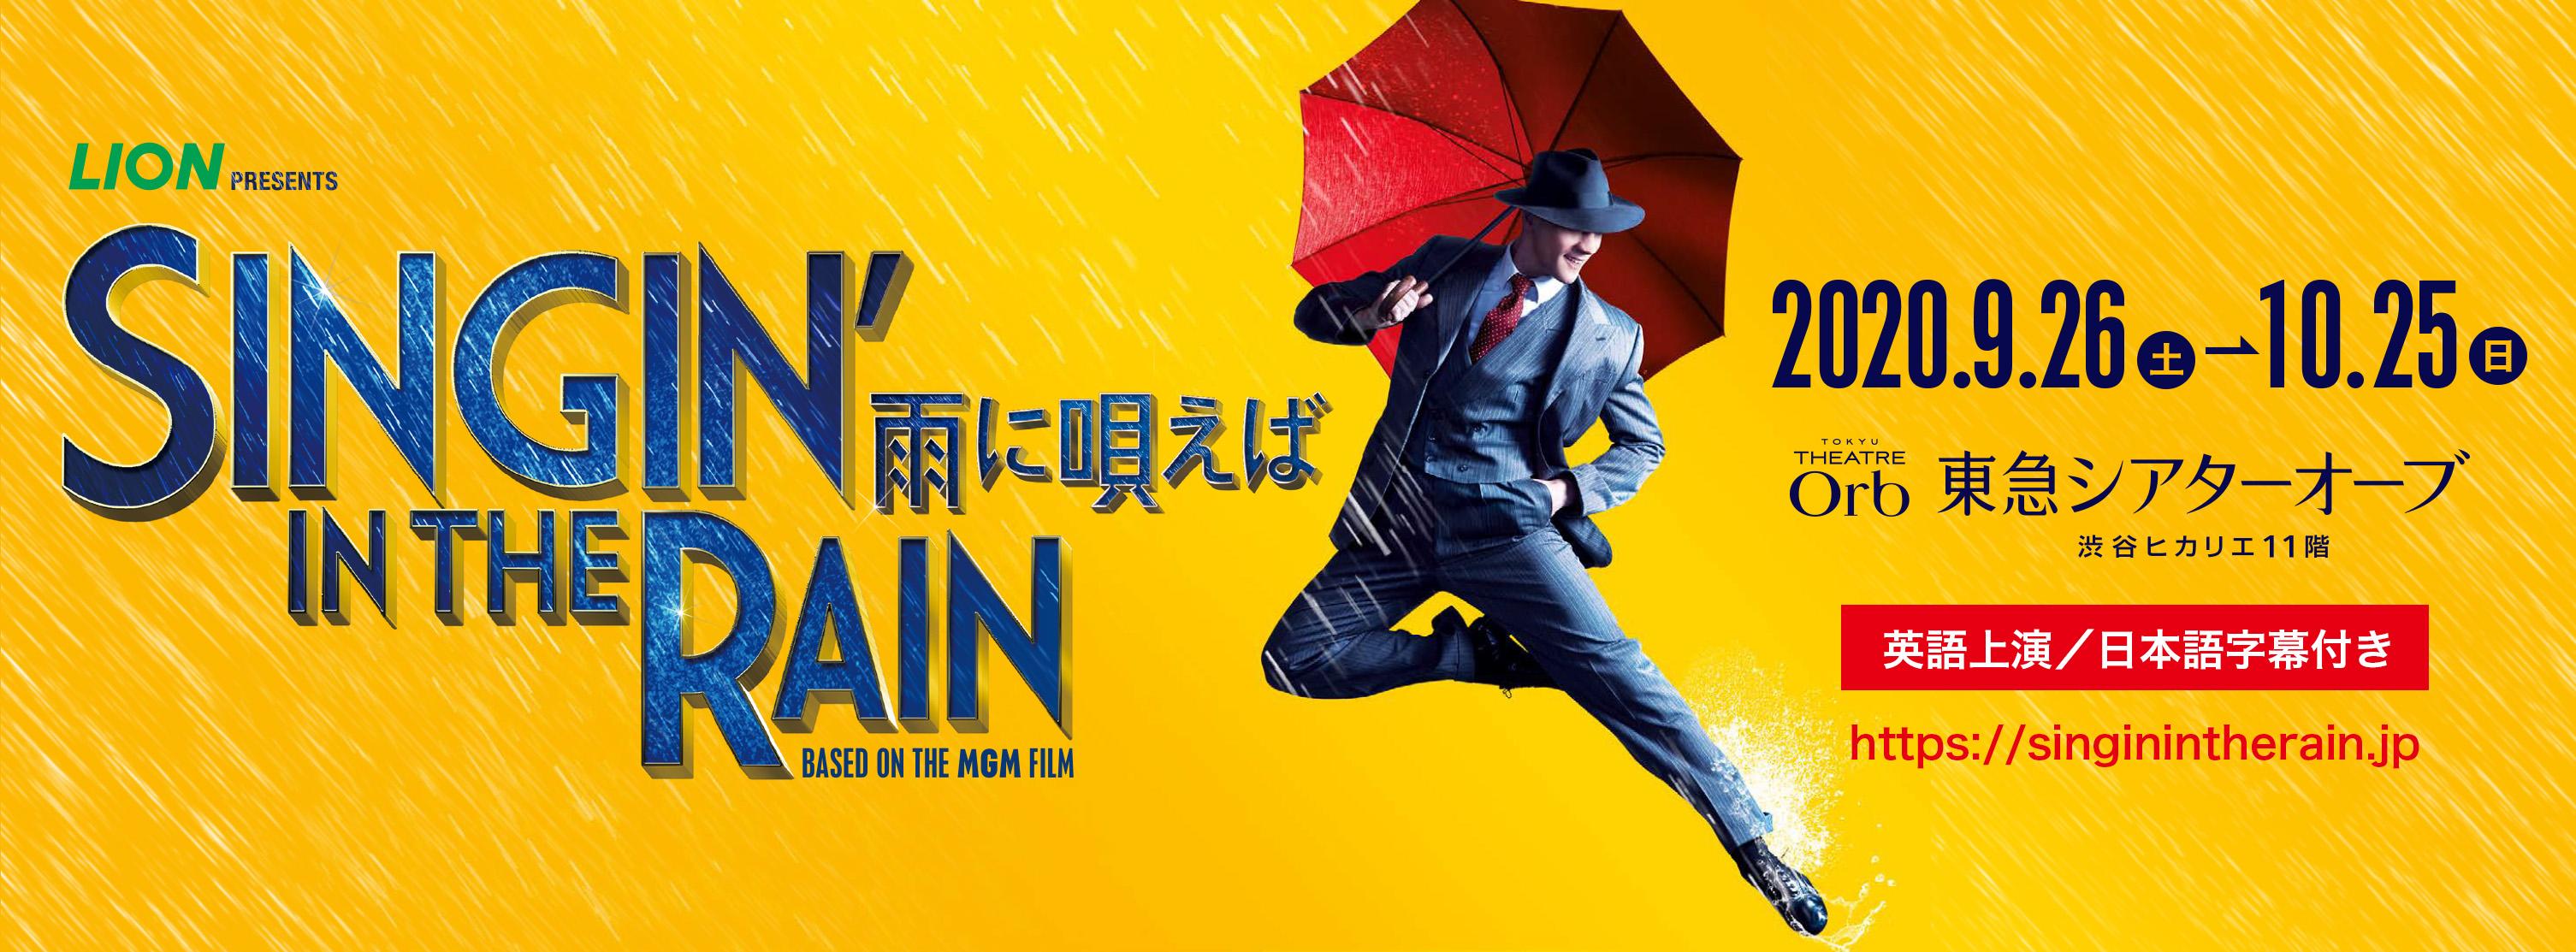 LION presents 『SINGIN'IN THE RAIN〜雨に唄えば〜』 | 【公式 ...